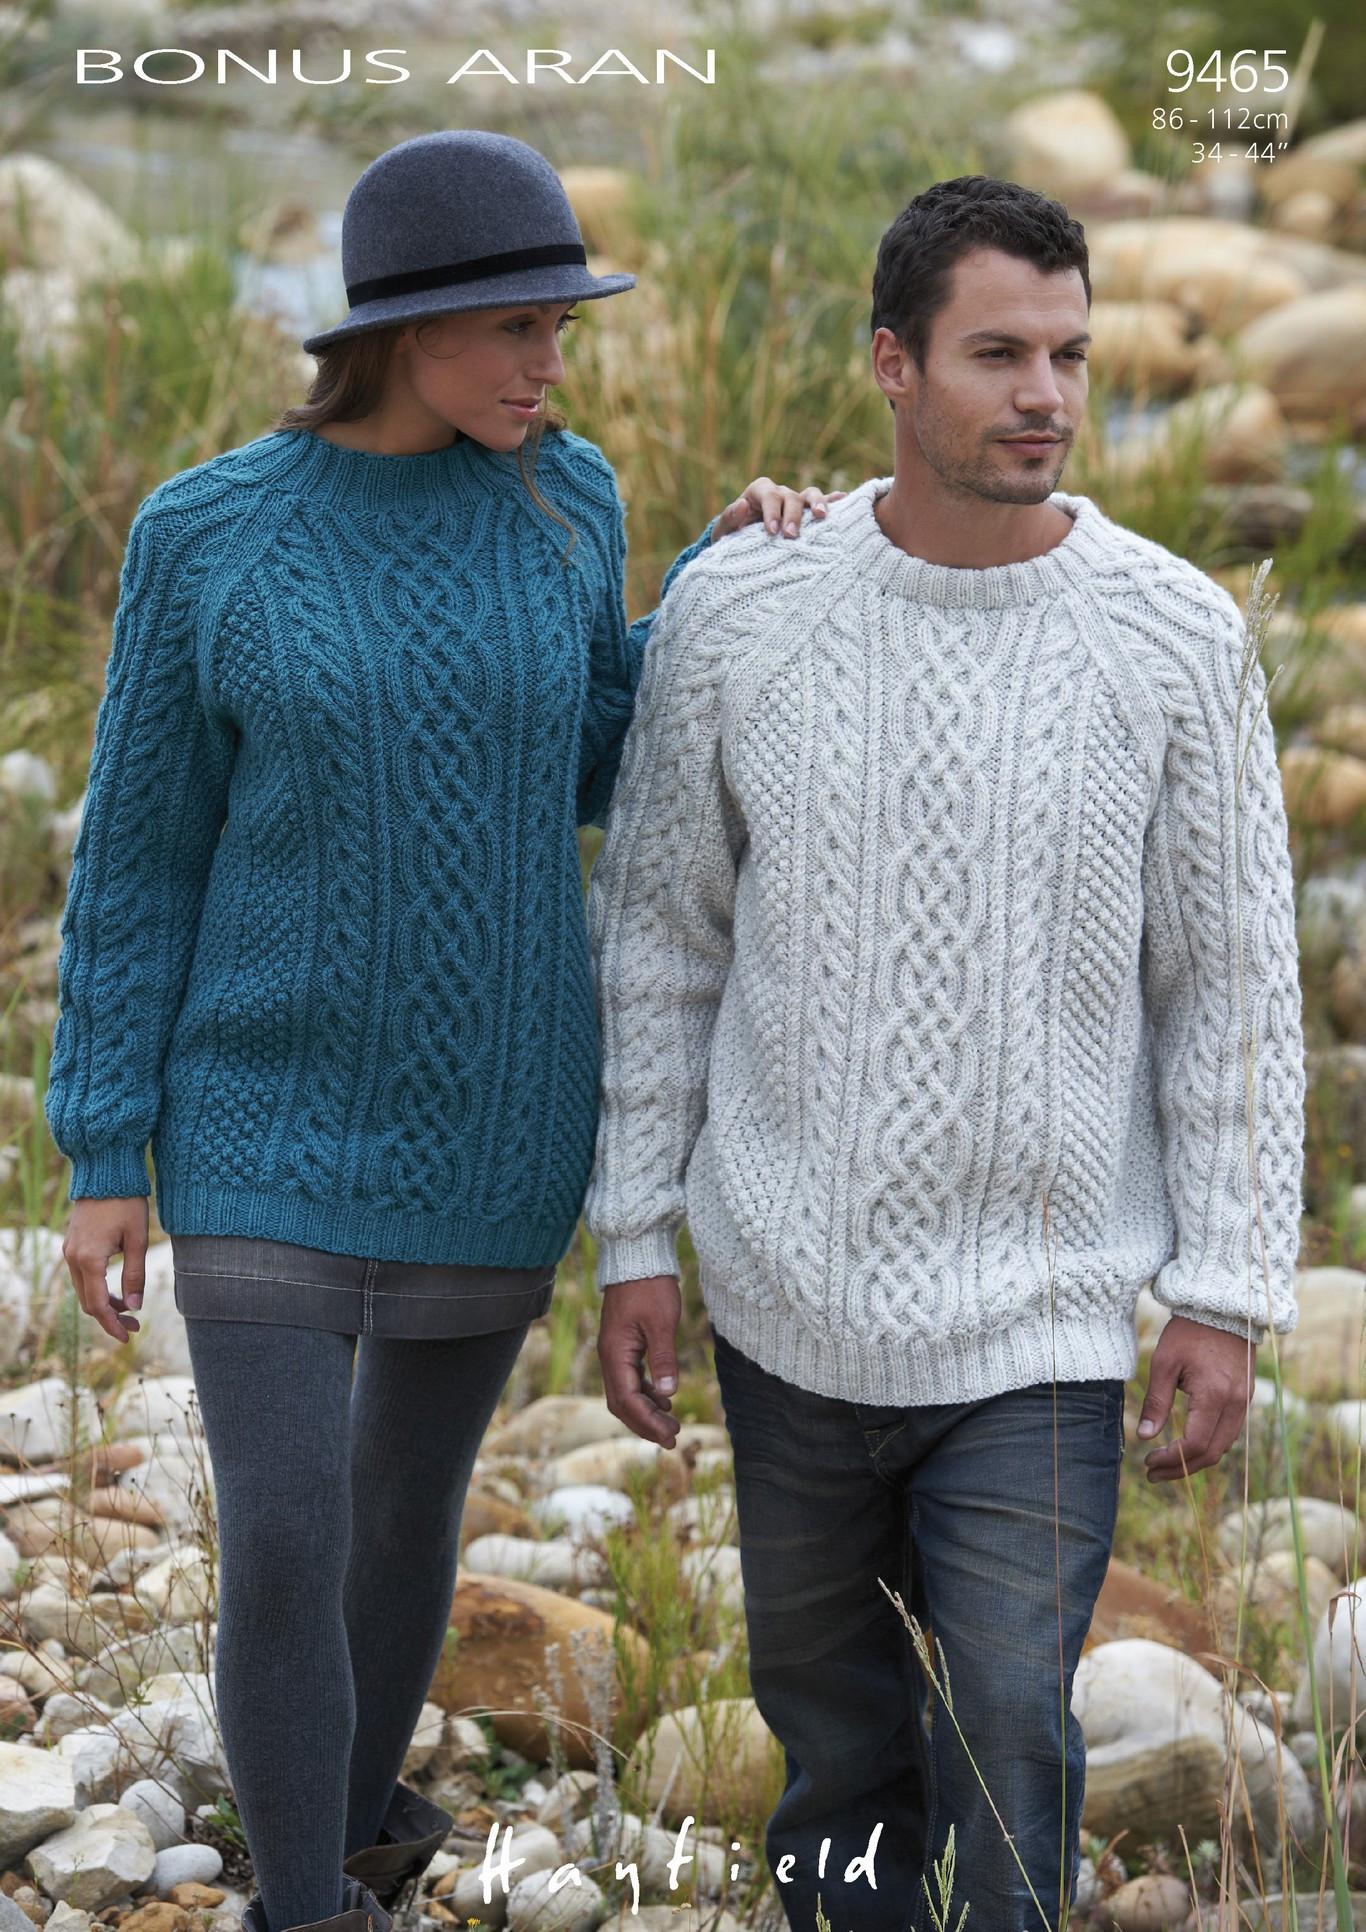 Unisex Hayfield Bonus Aran Sweaters